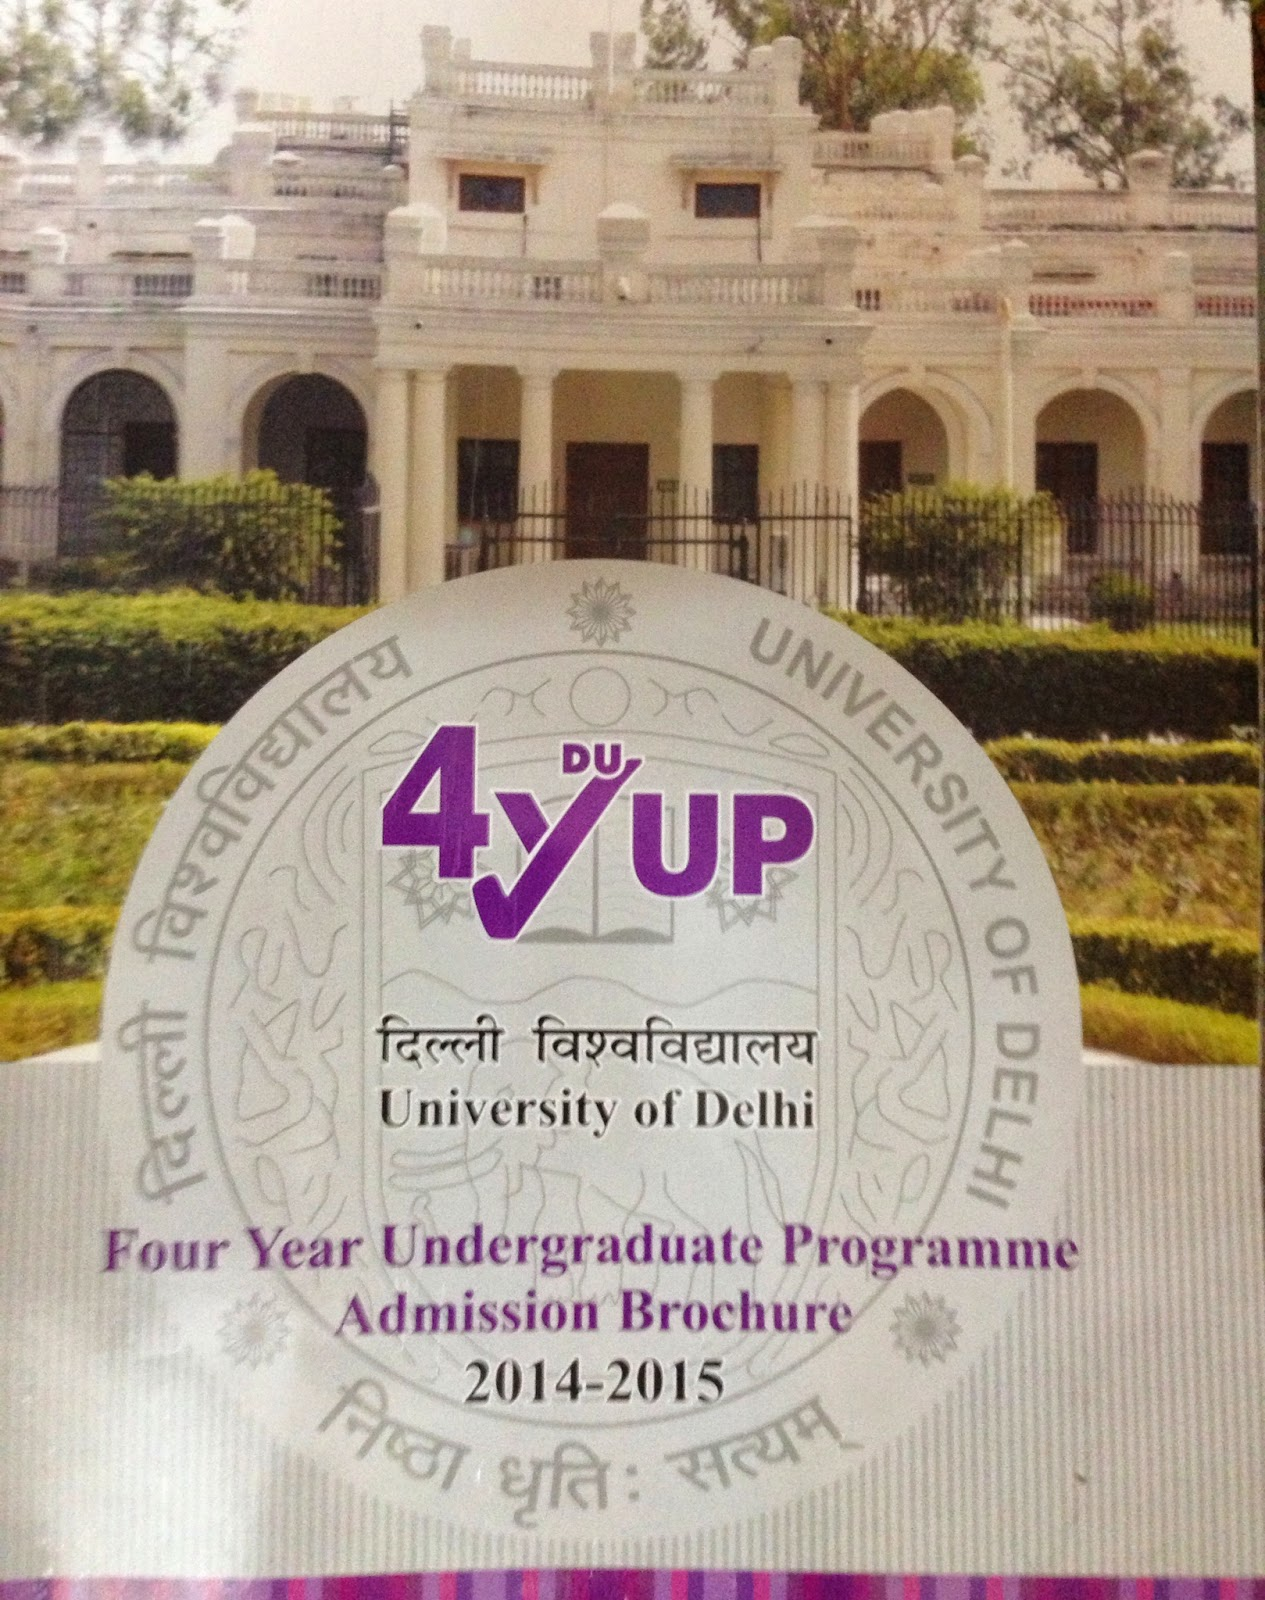 Delhi University Four Years Under Graduate Program Brochure 2014